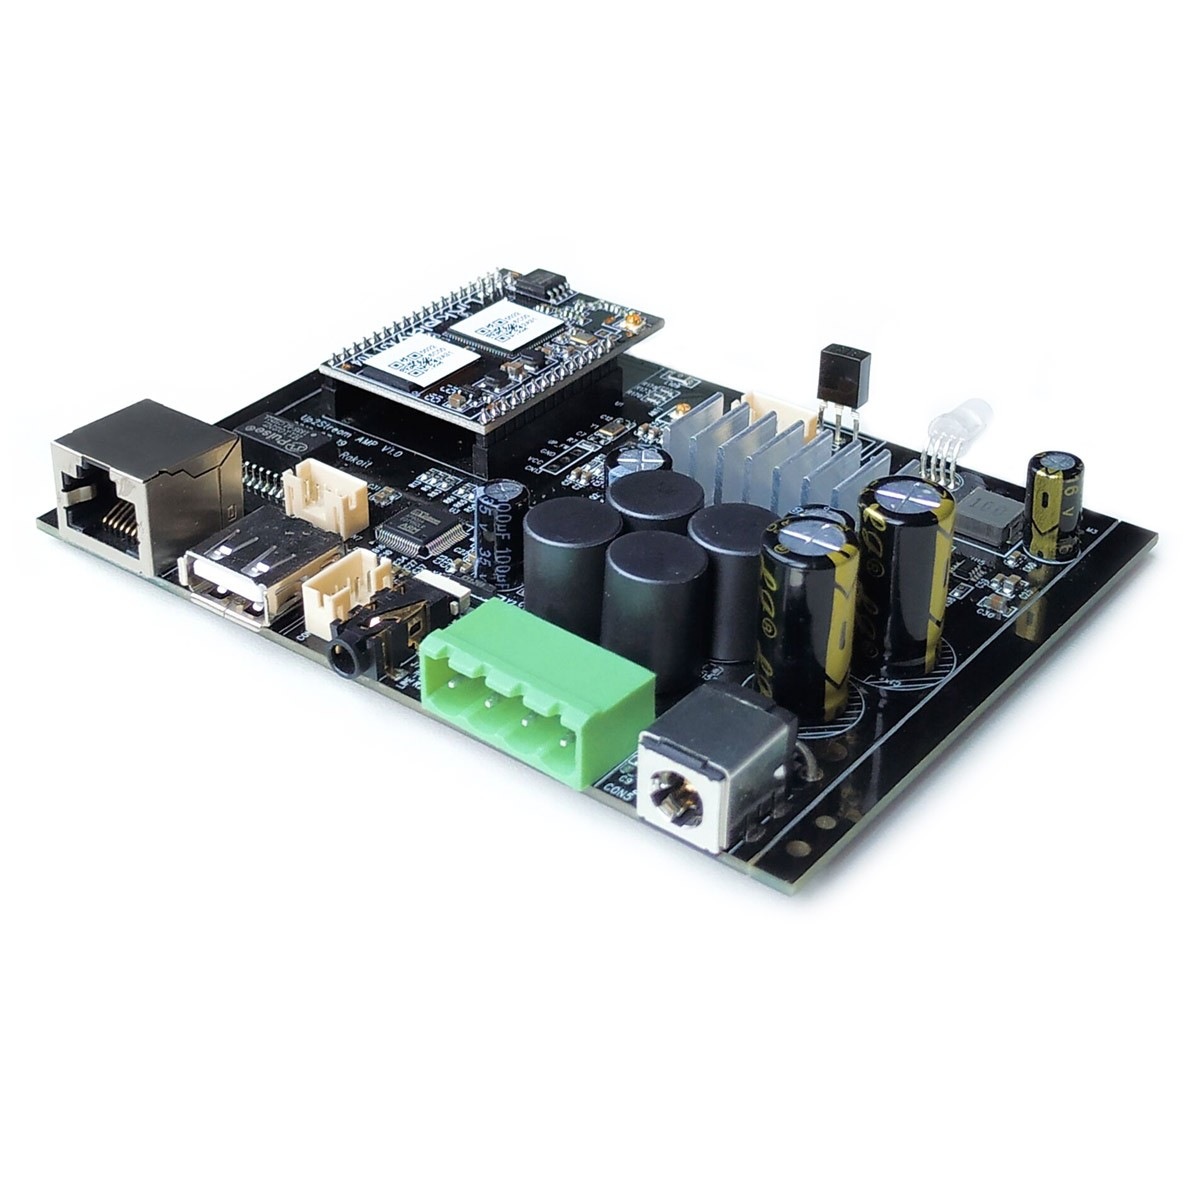 ARYLIC UP2STREAM AMP PRO D6 Module Amplificateur WiFi DLNA Bluetooth 5.0 2x50W 4 Ohm 24bit 192kHz